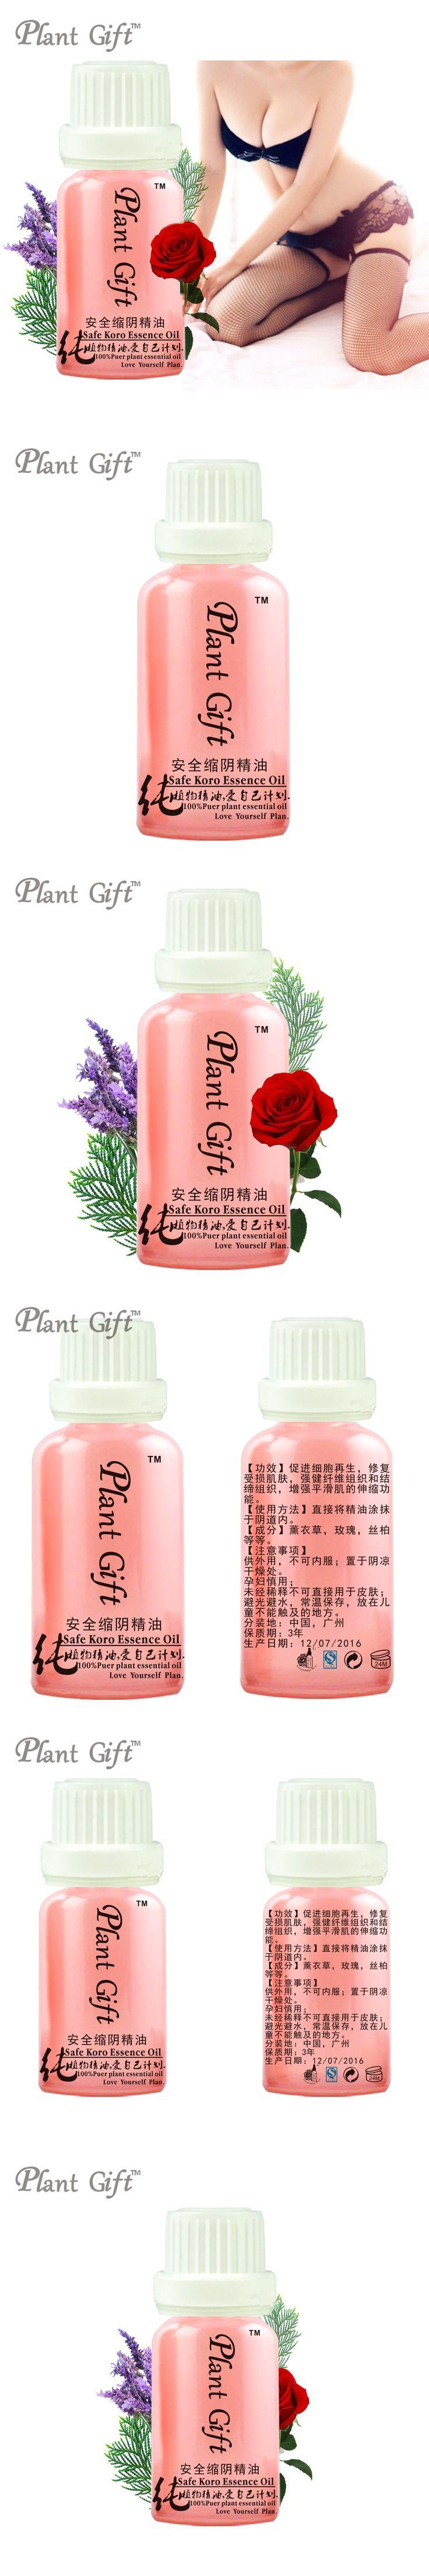 100% Compound Essential Oil Safe Koro Essence Oil Lavender, Rose, Cypress,Promote Cell Regeneration, Repair Damaged Skin